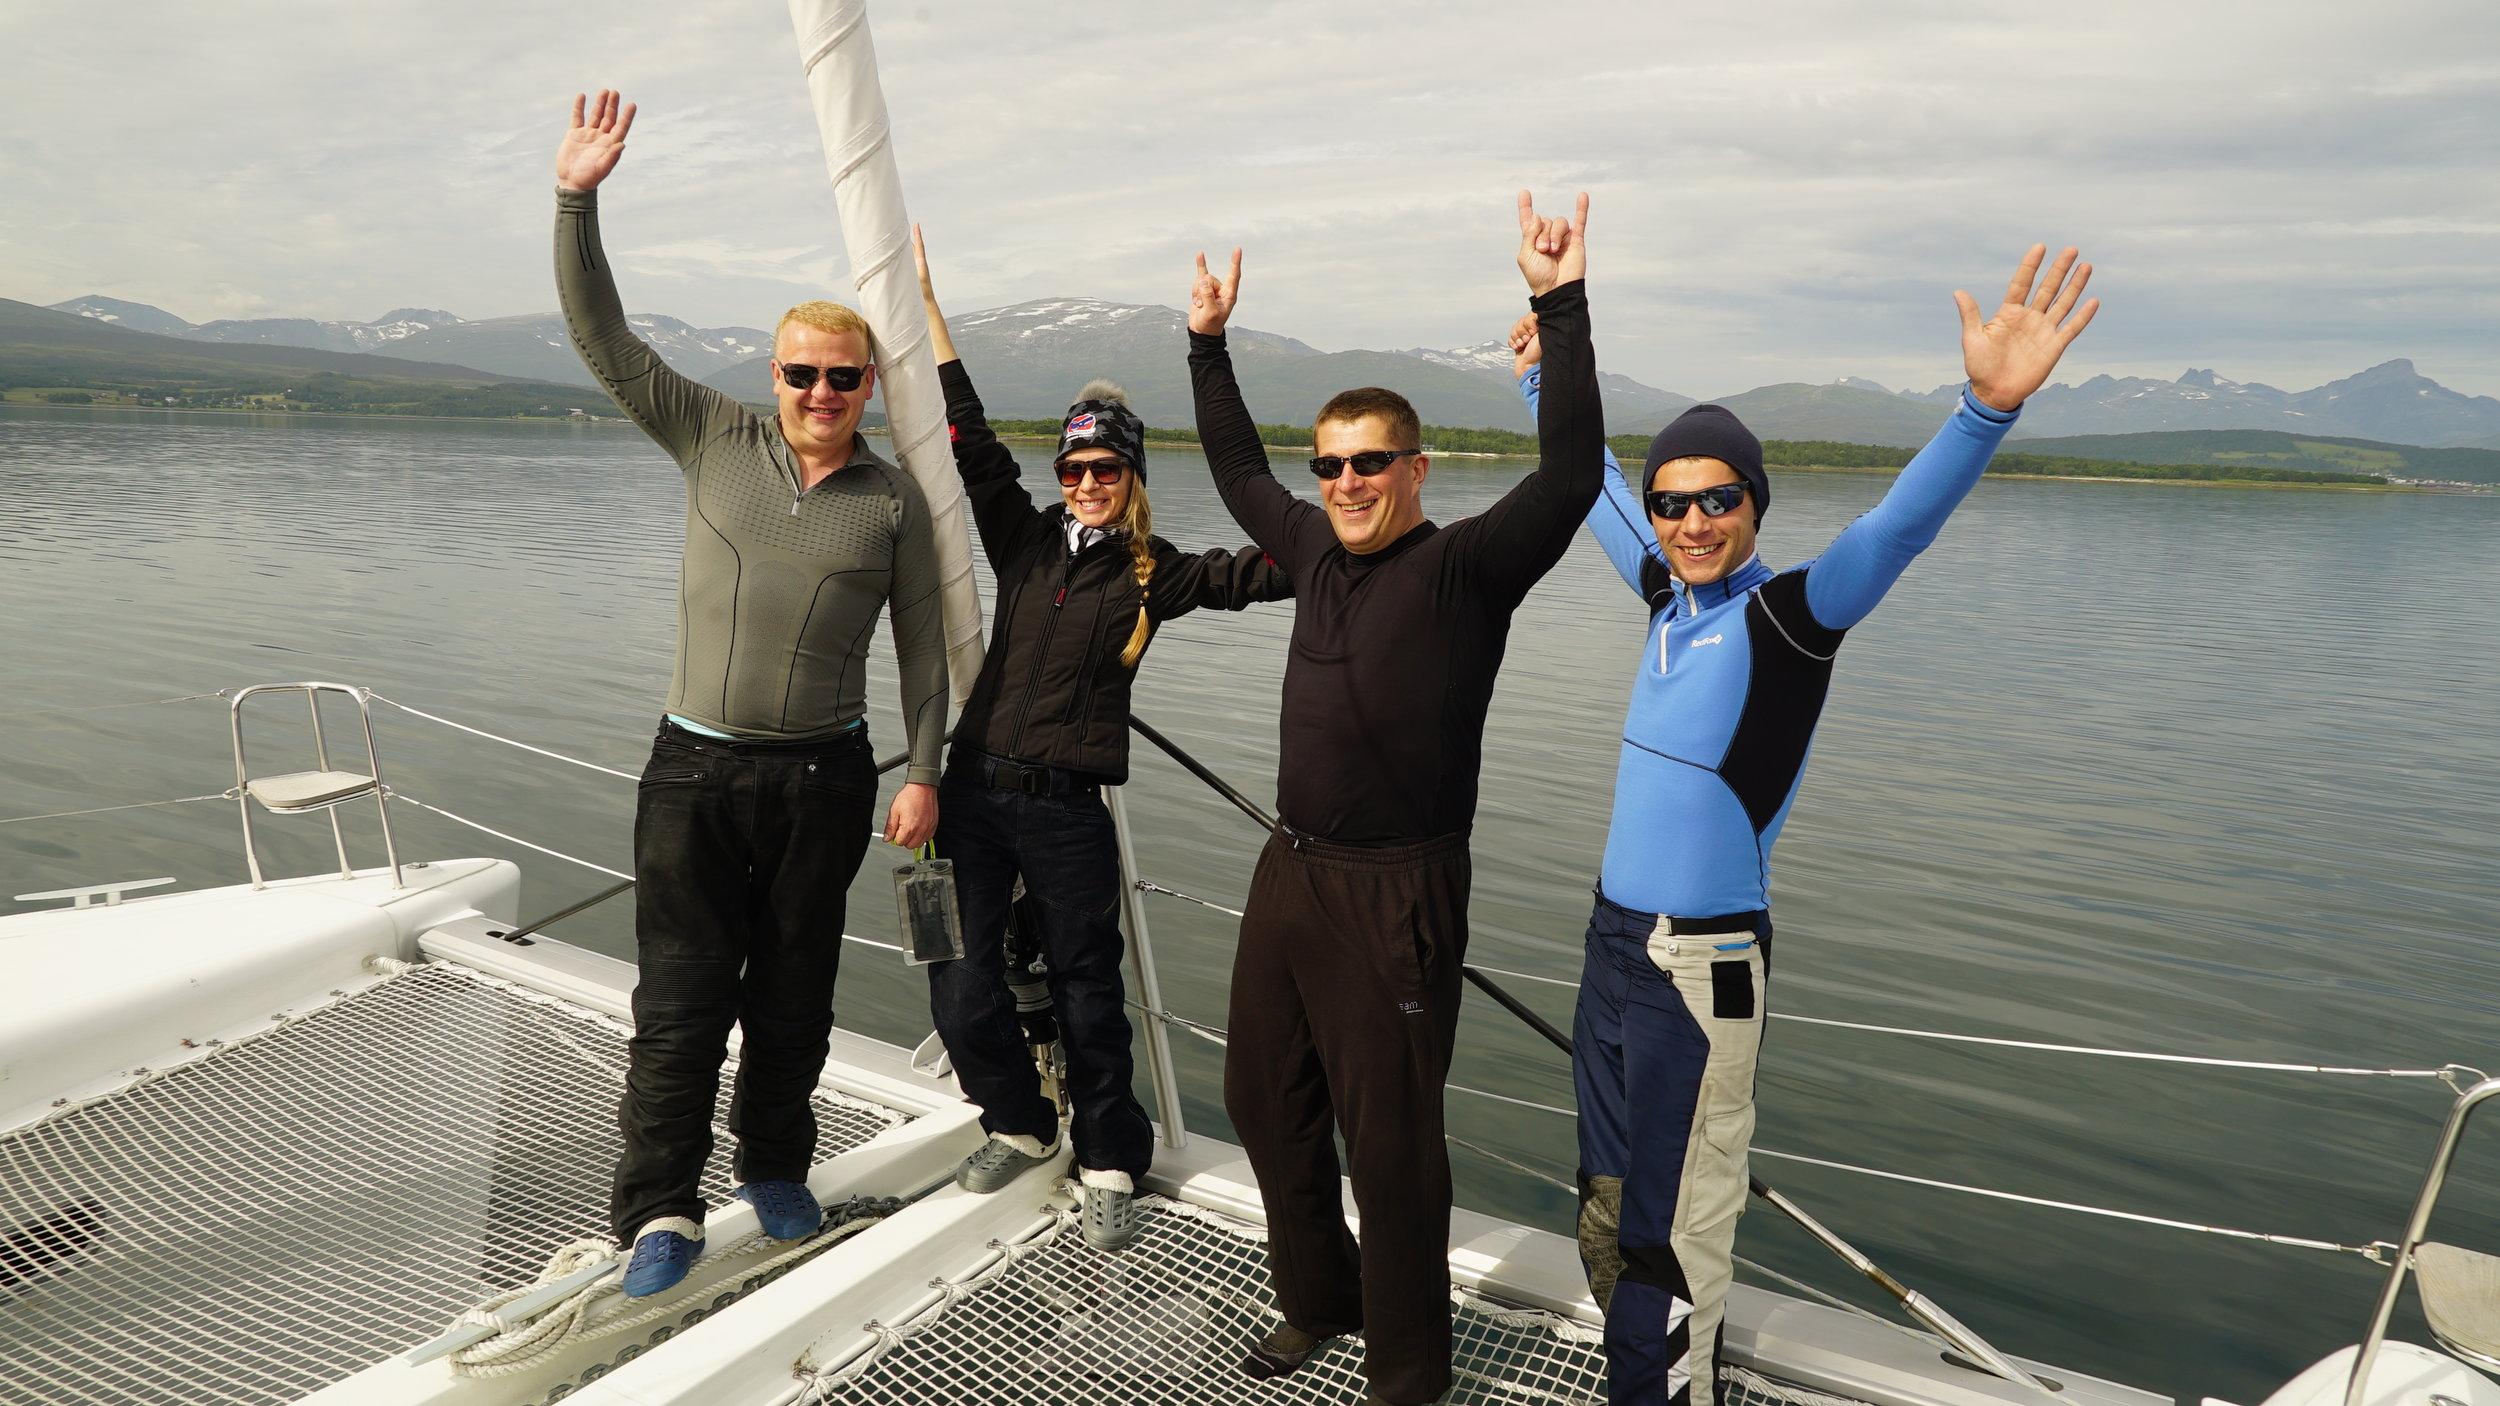 #Sail & #relax |#Tromsø | #Fishing | #Harley